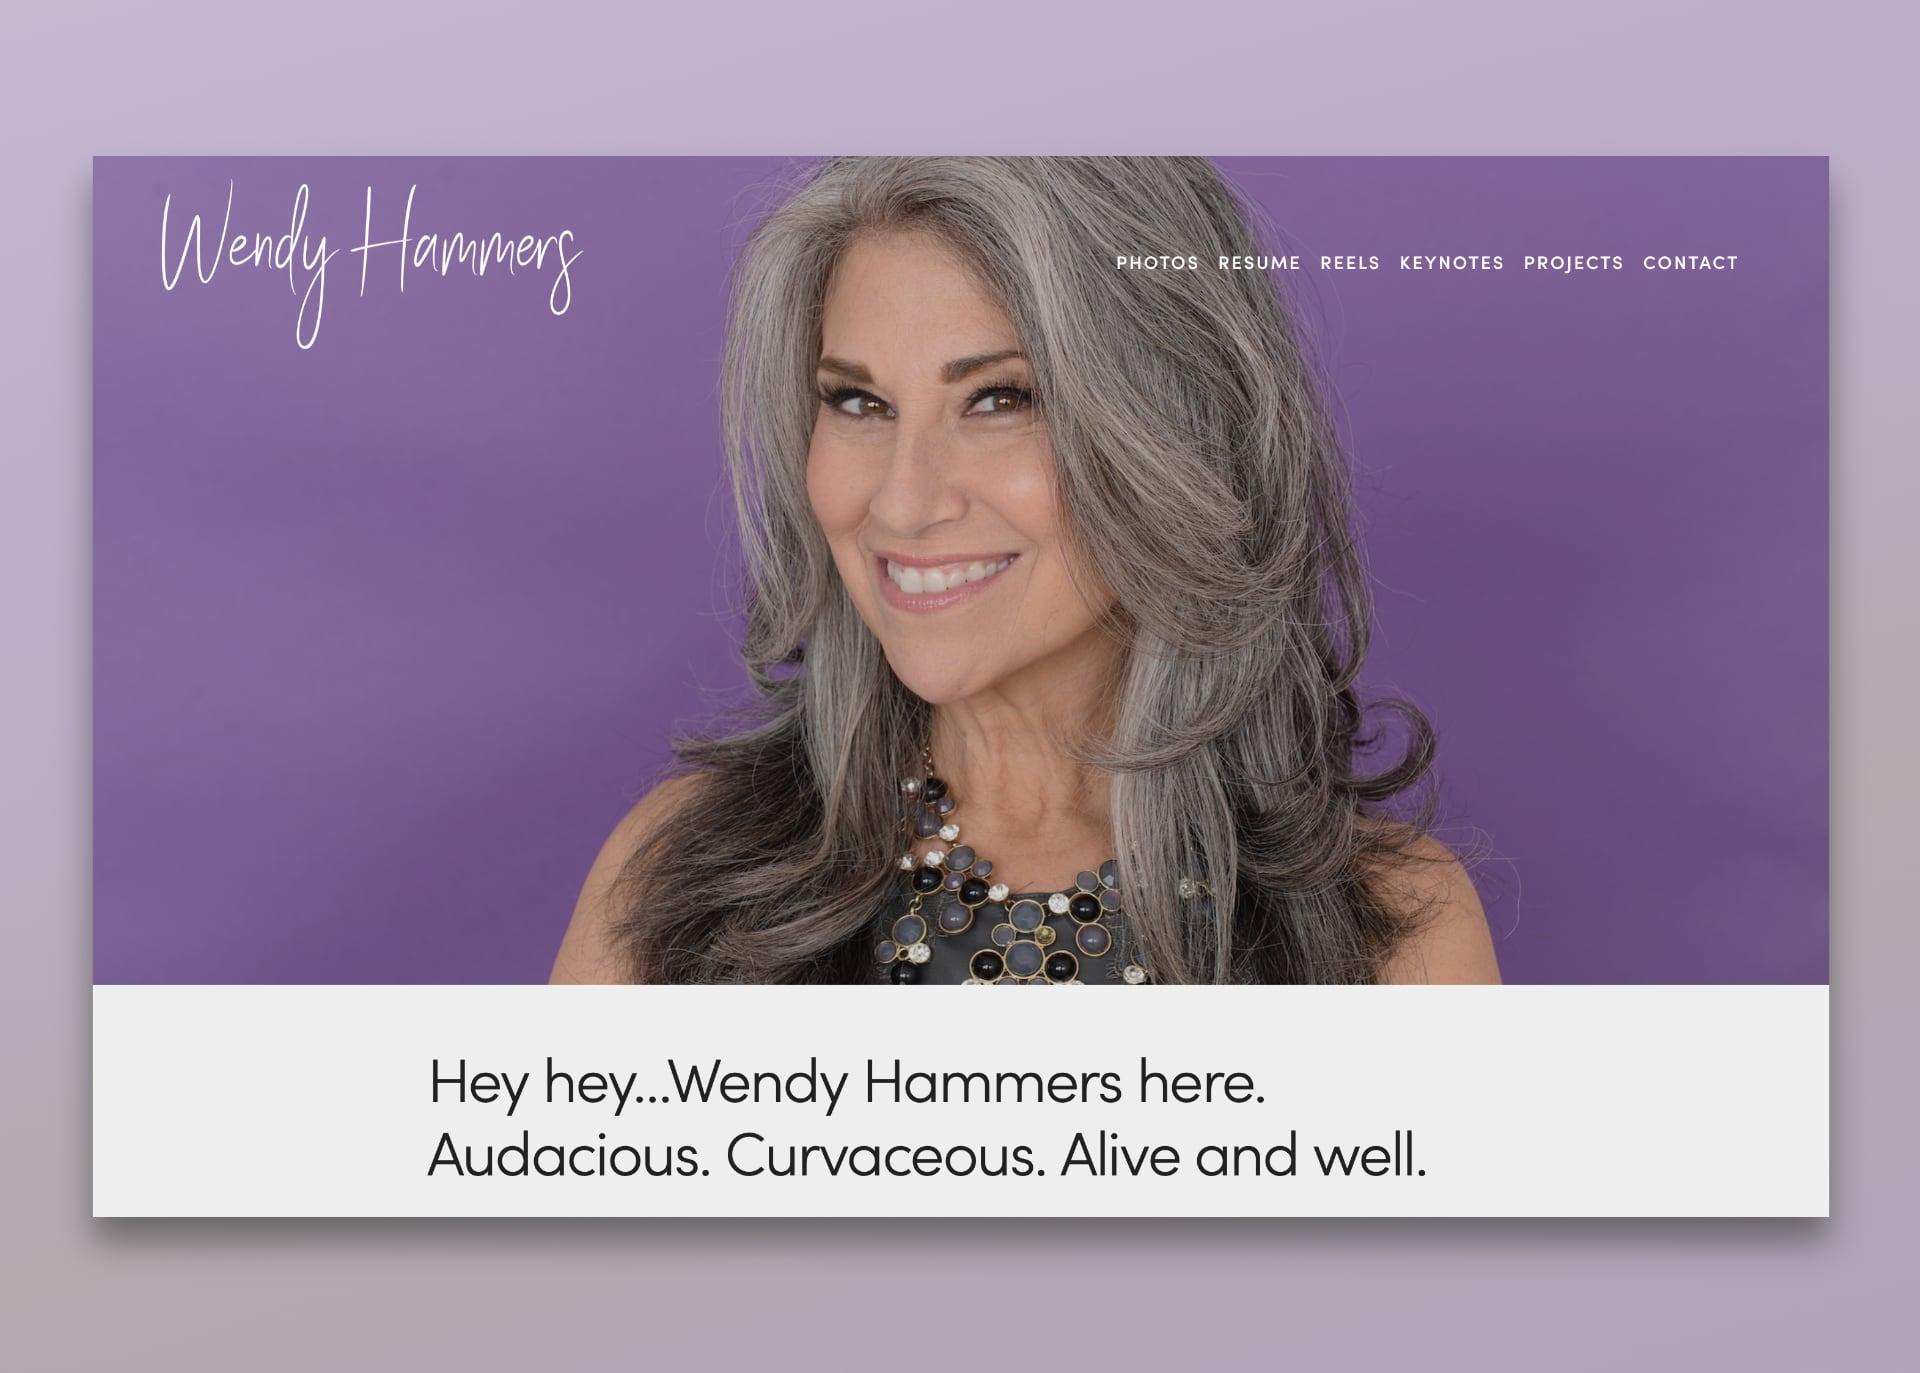 Wendy Hammers Widescreen.jpg